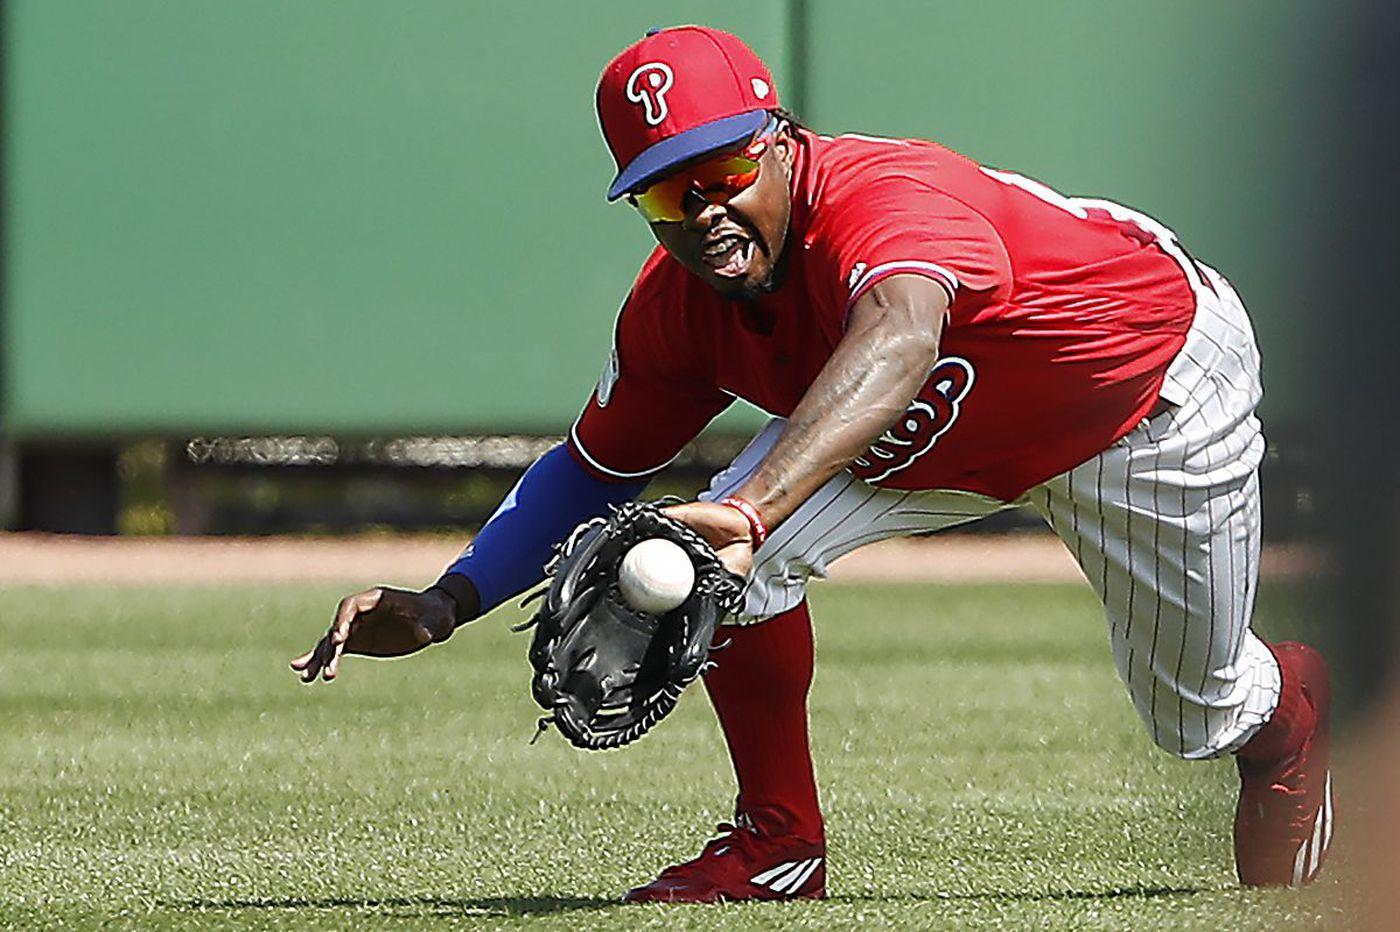 Spring training: Phillies trying prospect Roman Quinn at shortstop